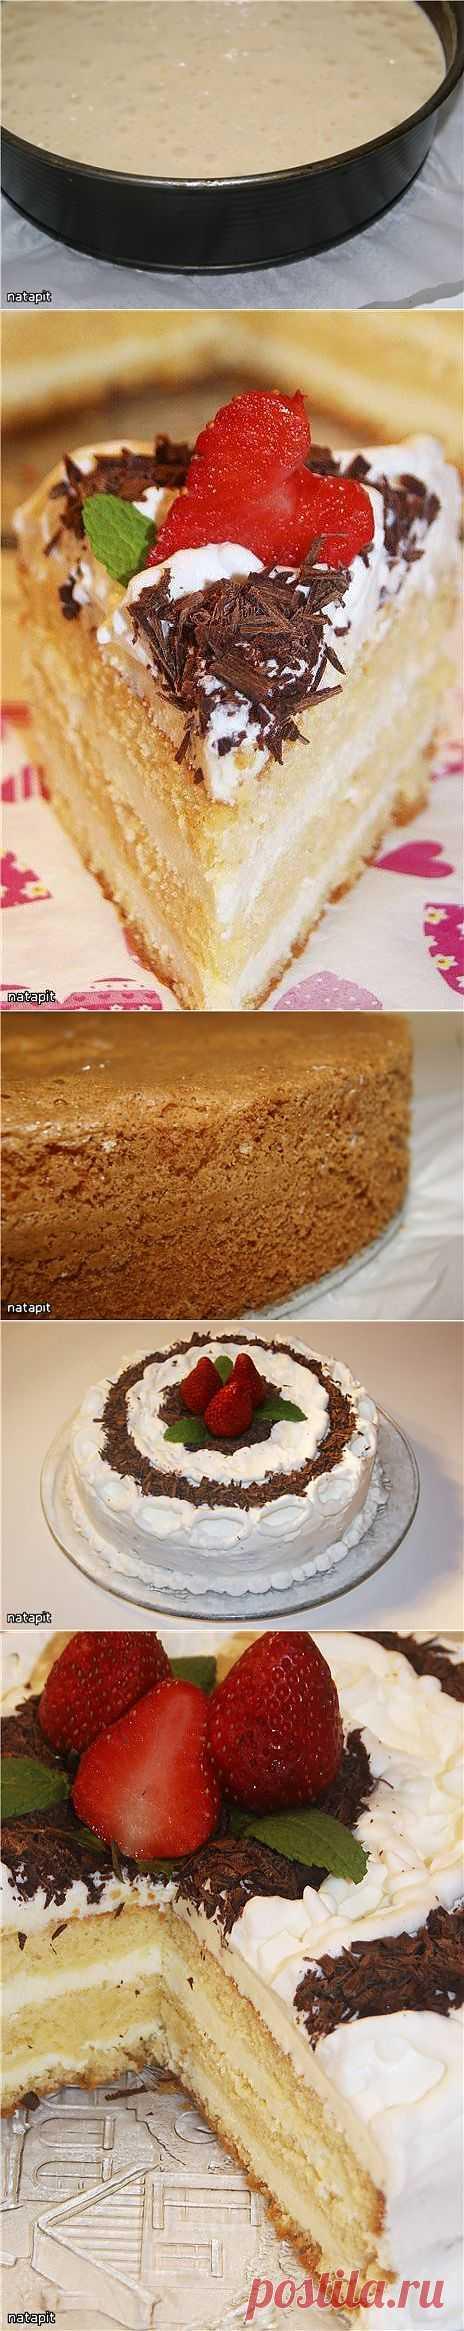 "Торт ""Белый трюфель"" Tartufo Bianco."